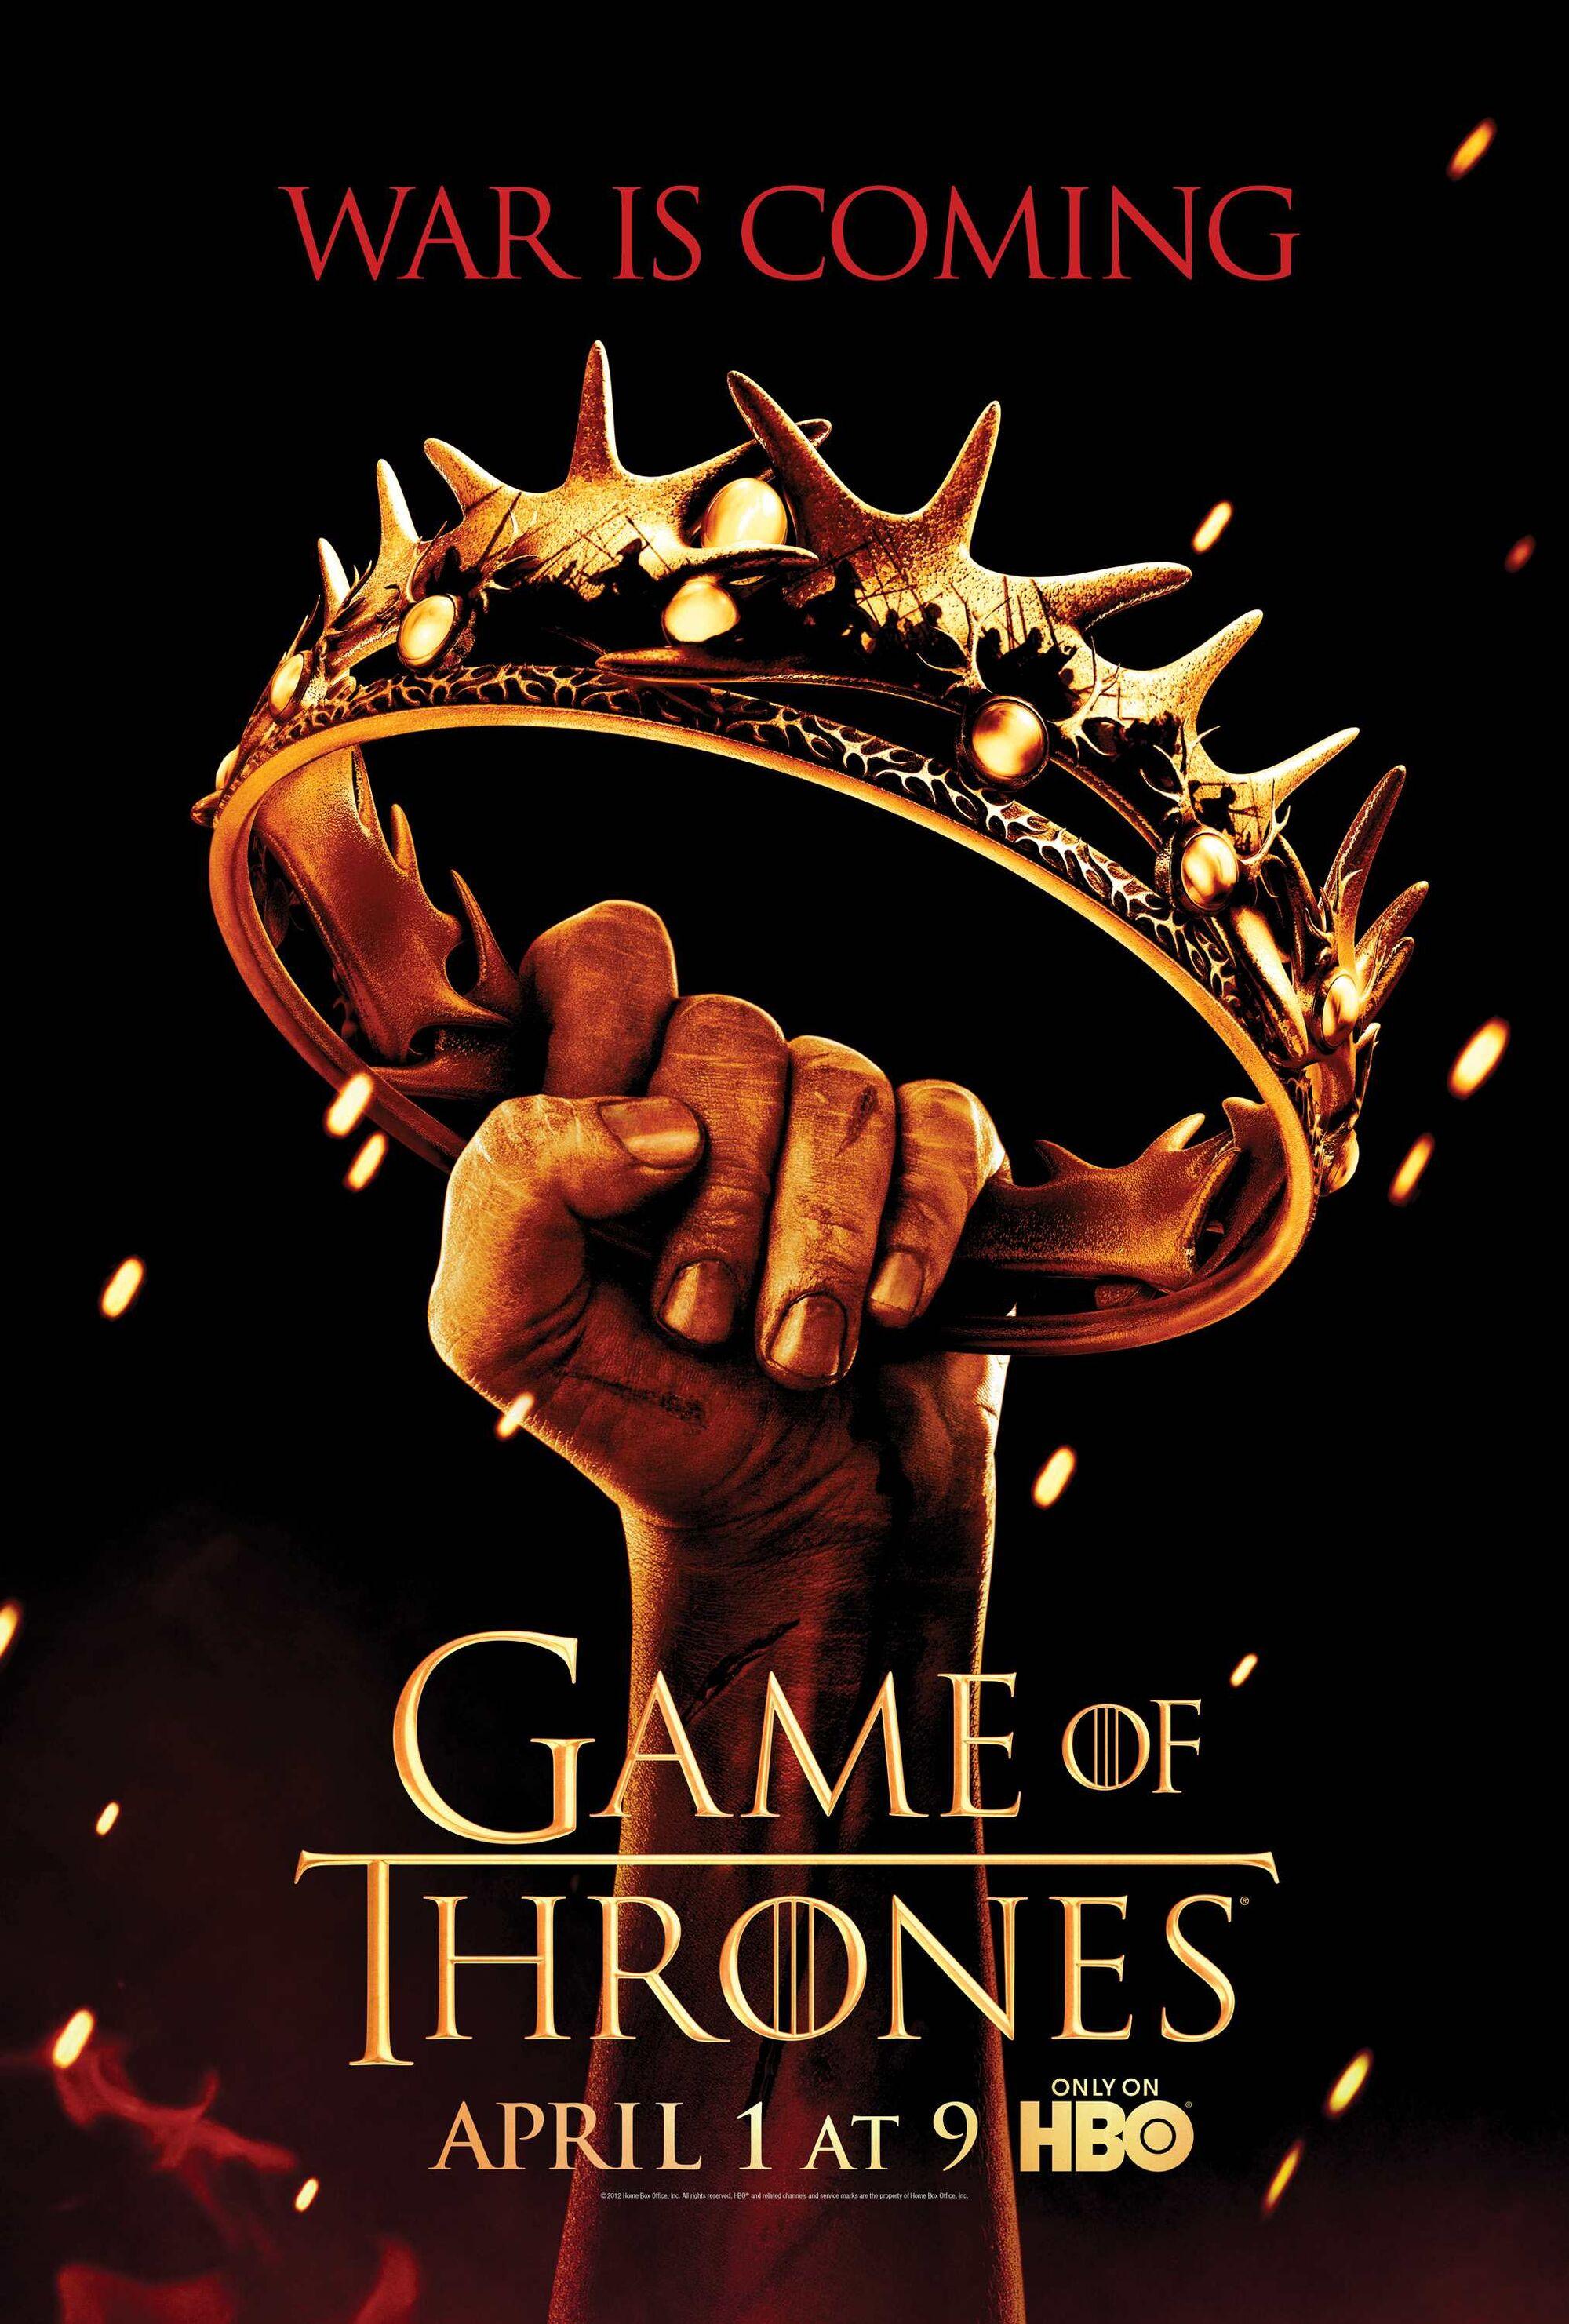 Game of thrones season 2 war of the kings casino niagara shuttle bus from hamilton